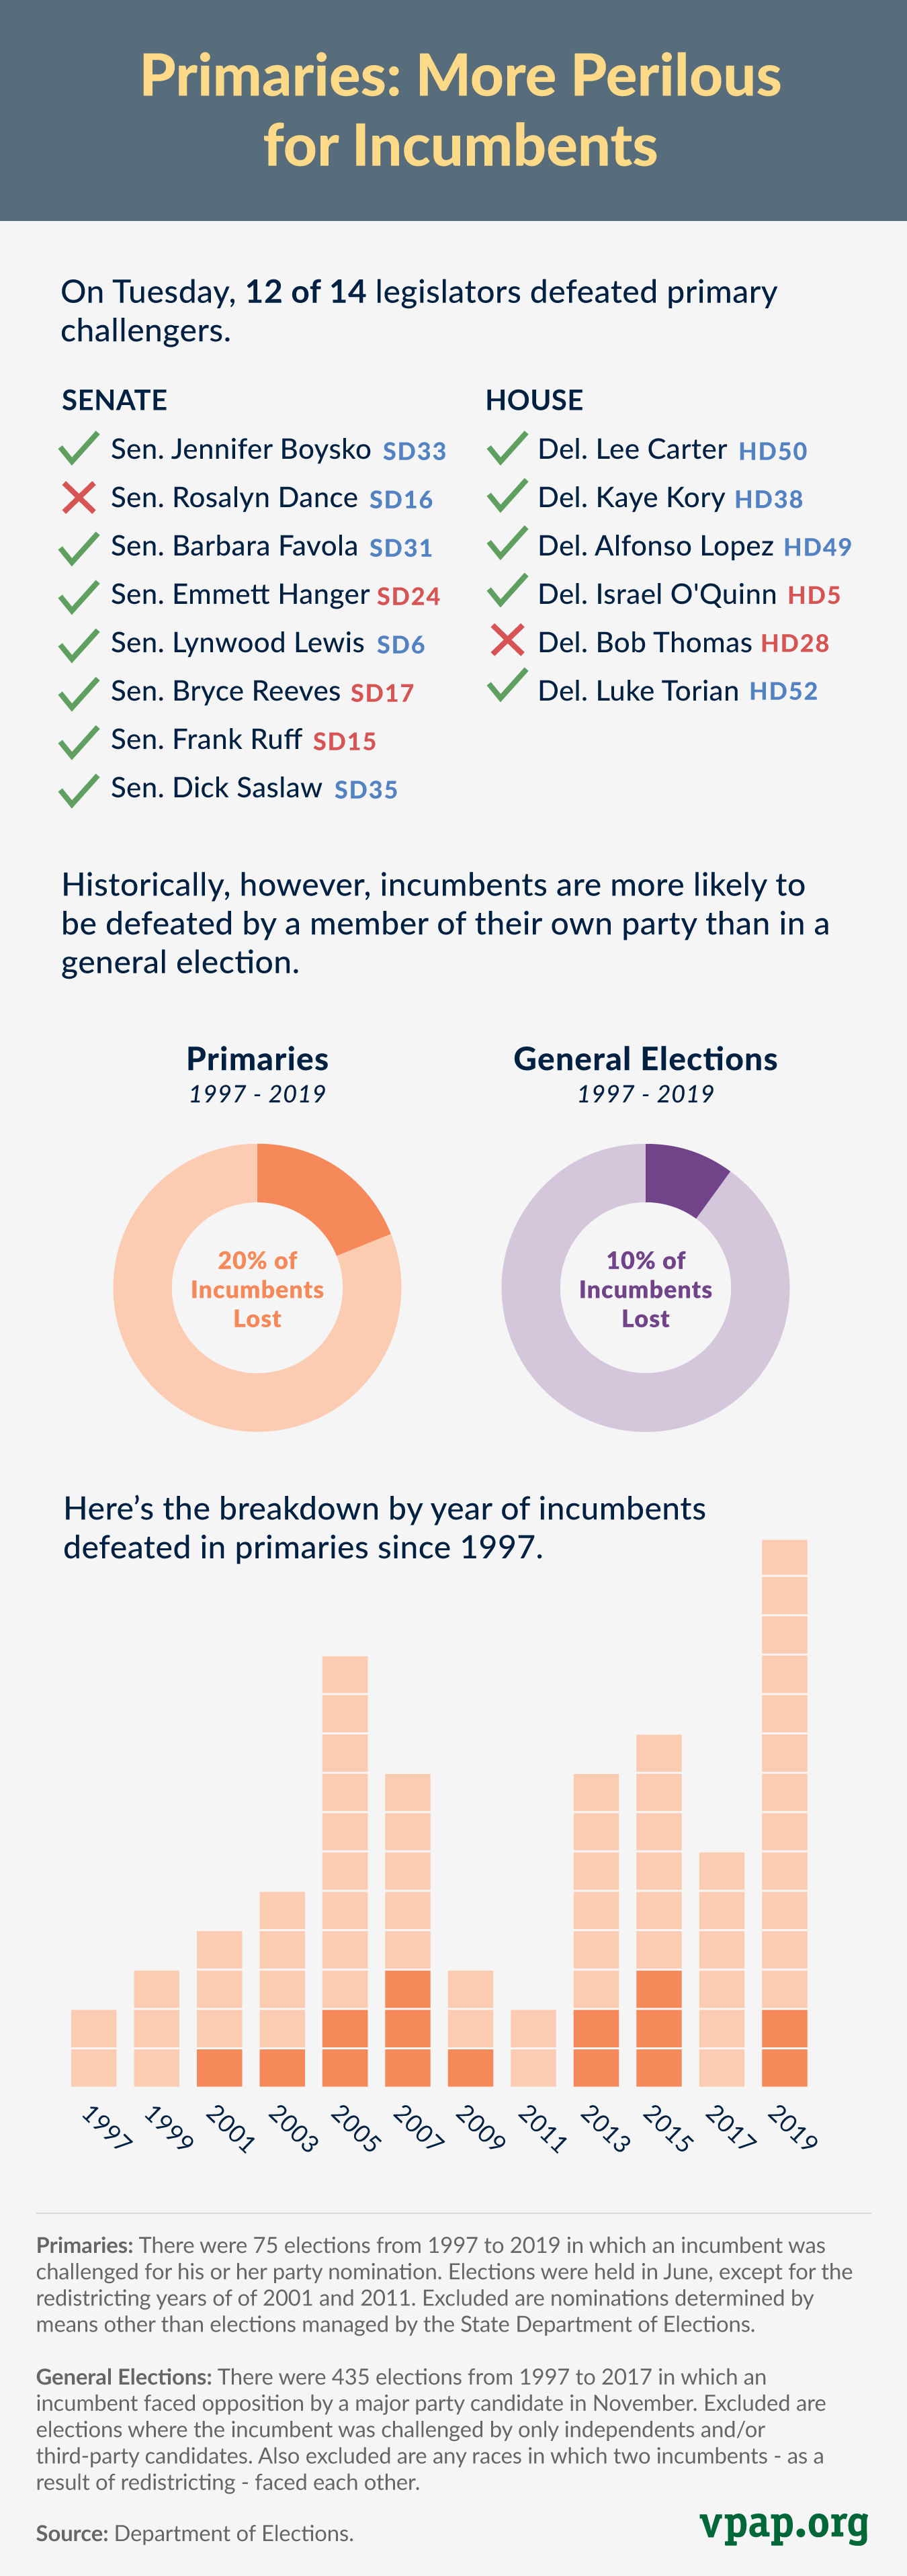 Primaries: More Perilous for Incumbents